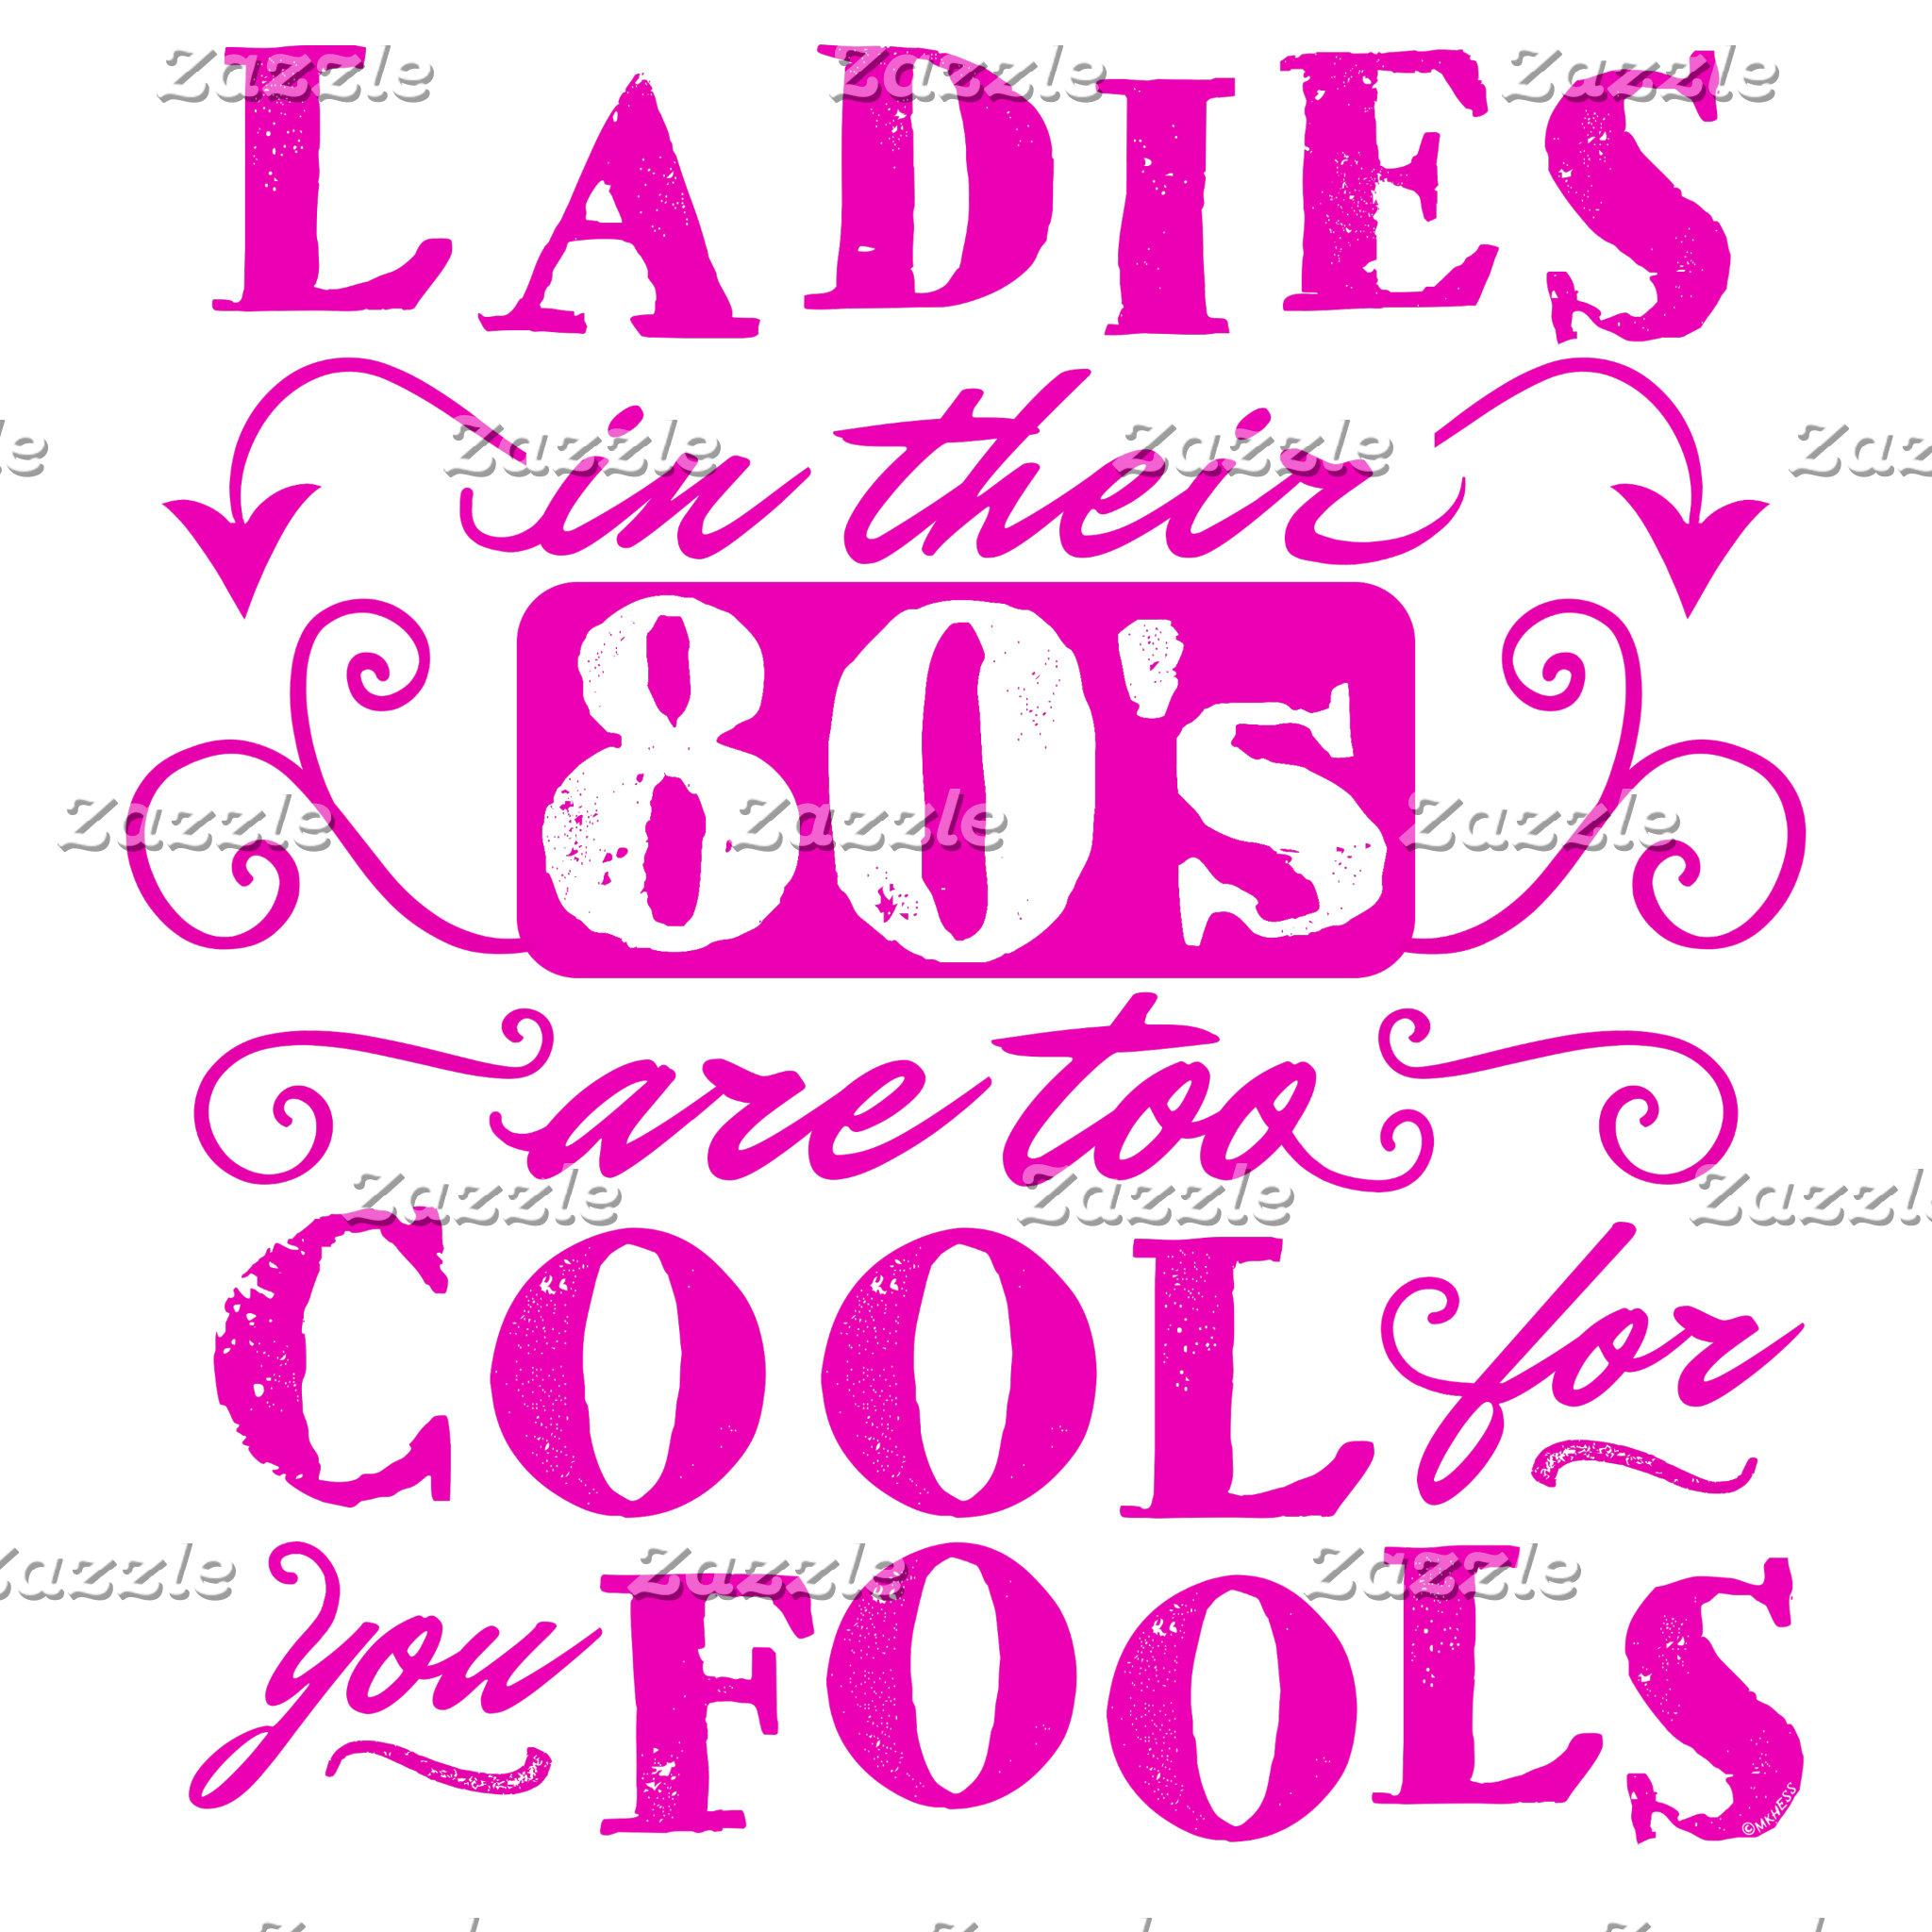 Ladies in Their 80s